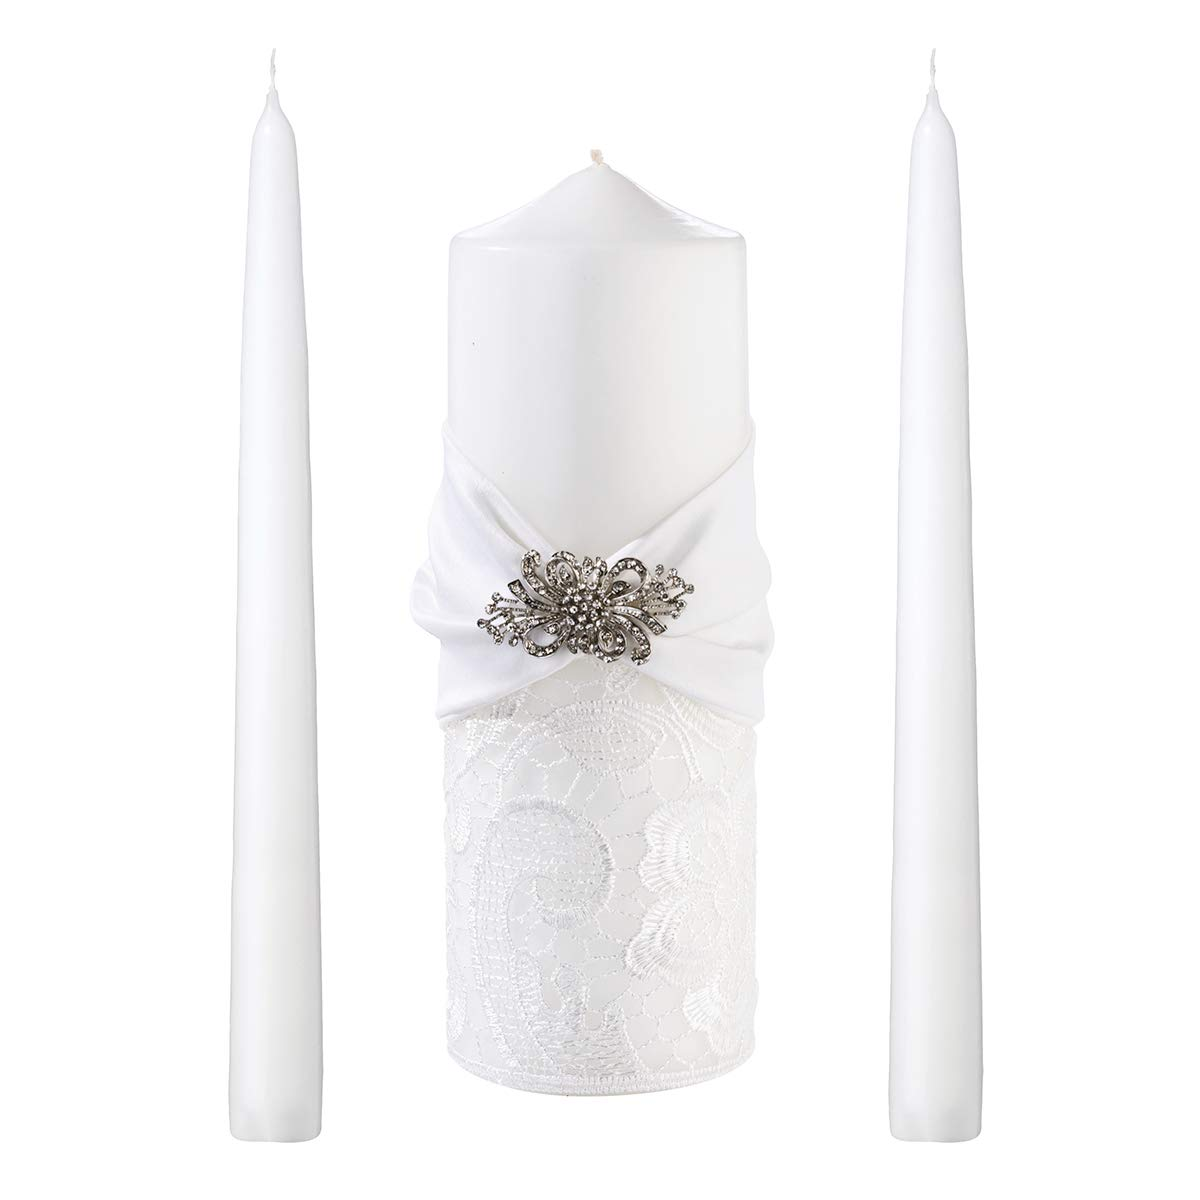 Lillian Rose WS727 W White Lace Wedding Unity Candle Set, 11.25 x 7.5 x 4.75, Multicolor